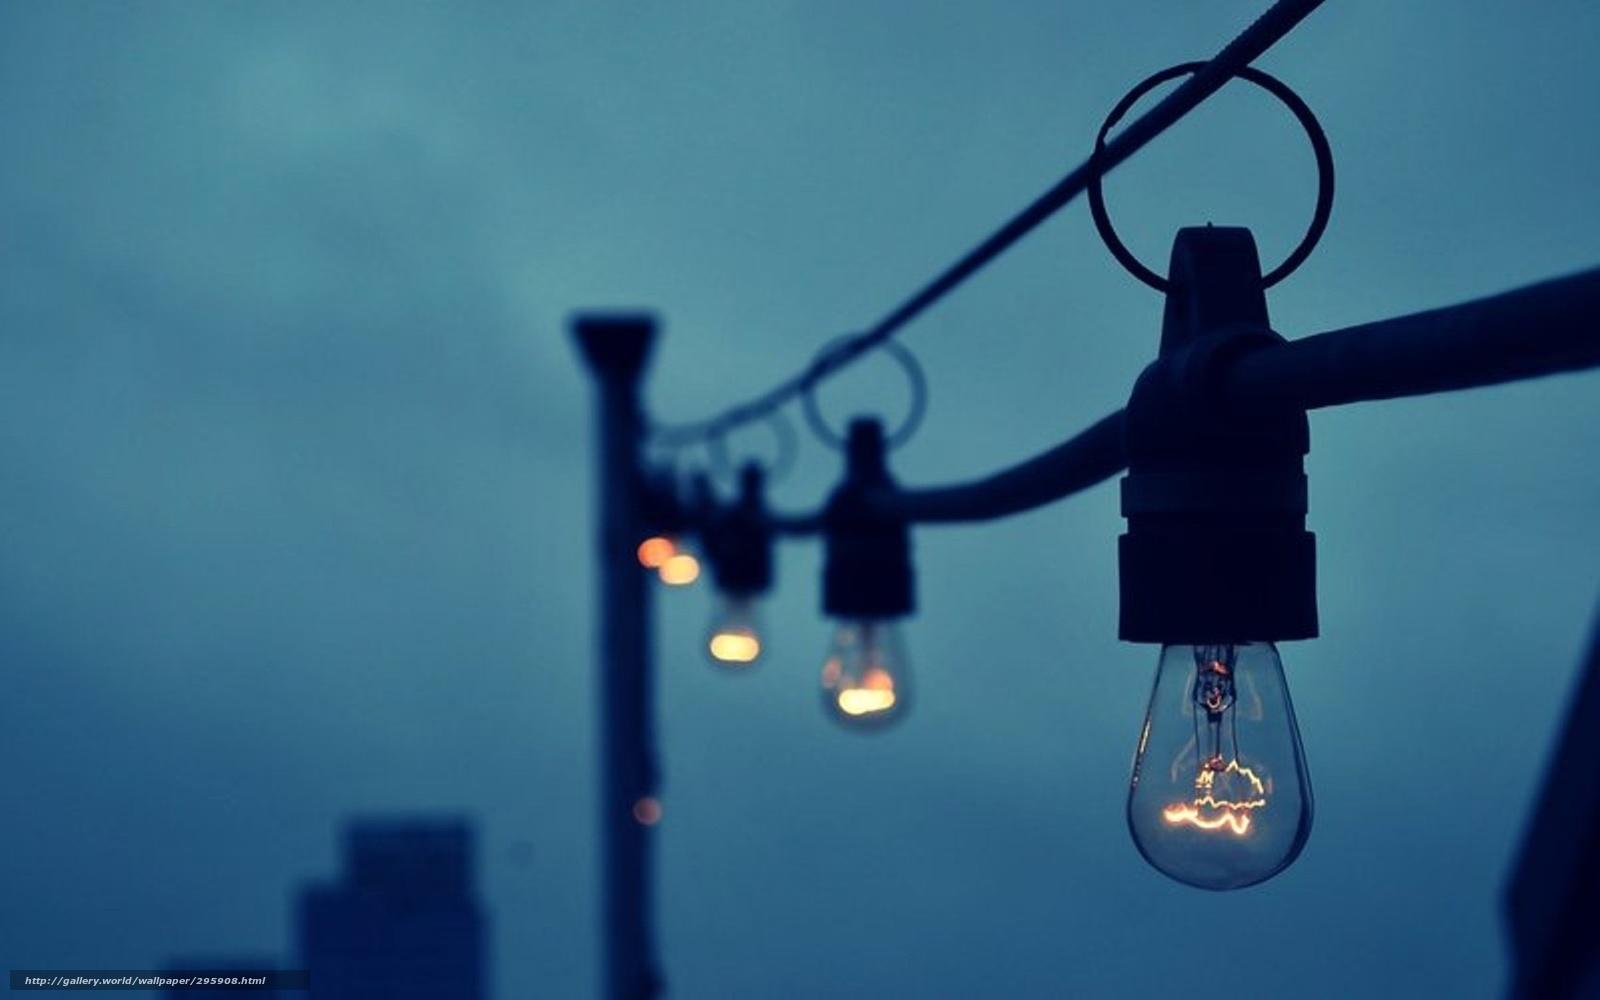 download wallpaper light bulb light evening wire free